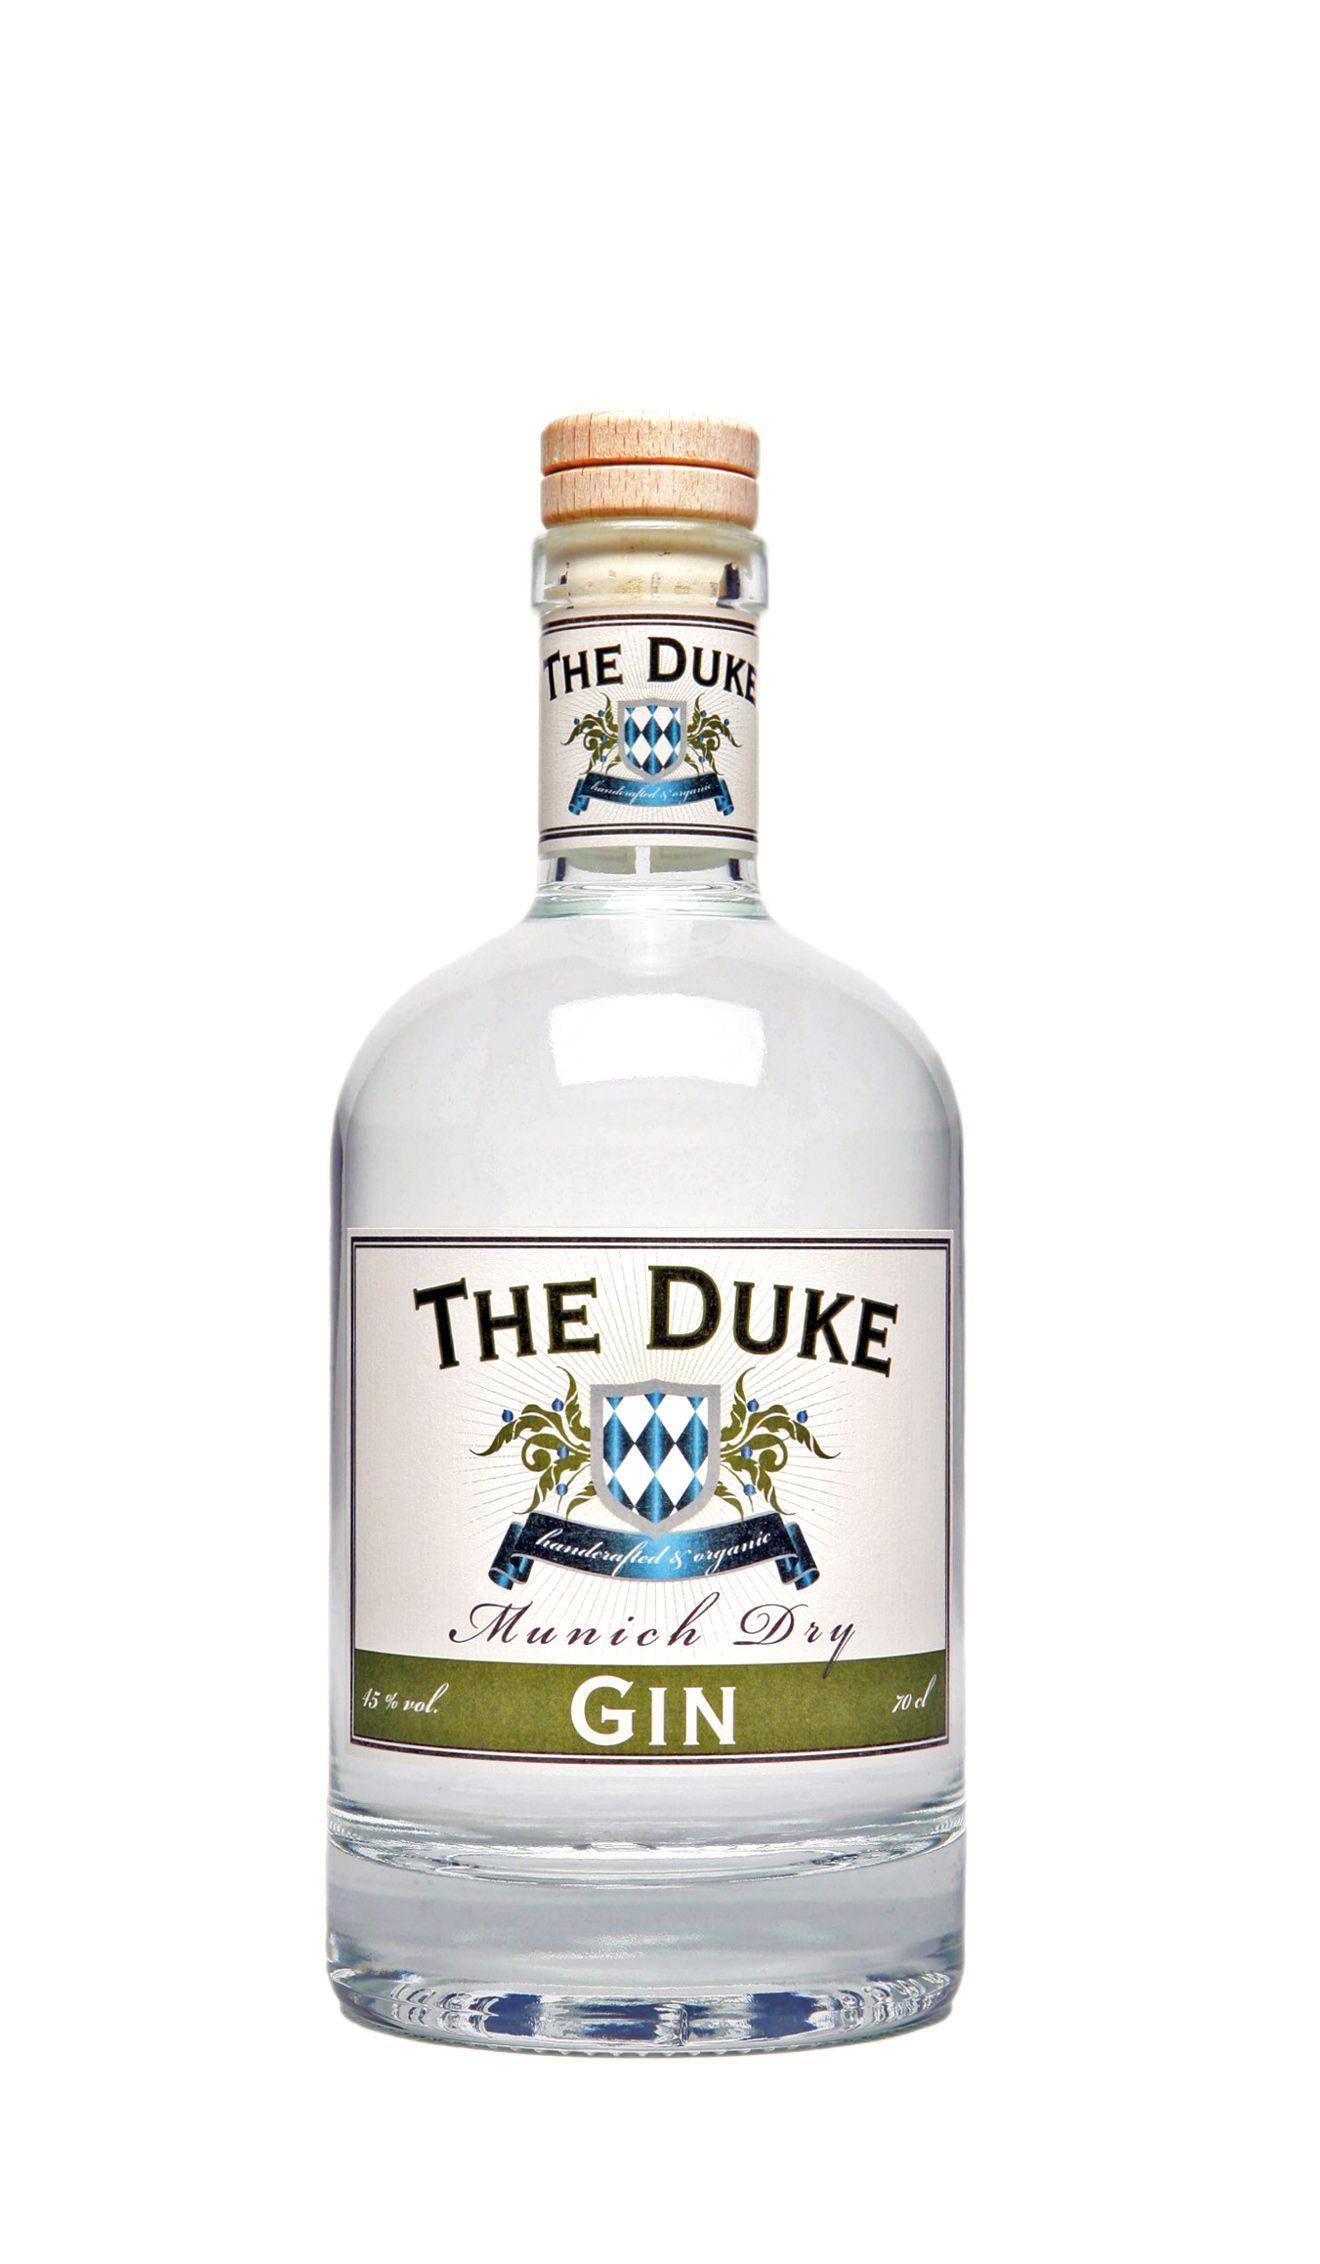 Gin / The Duke Munich Dry Gin